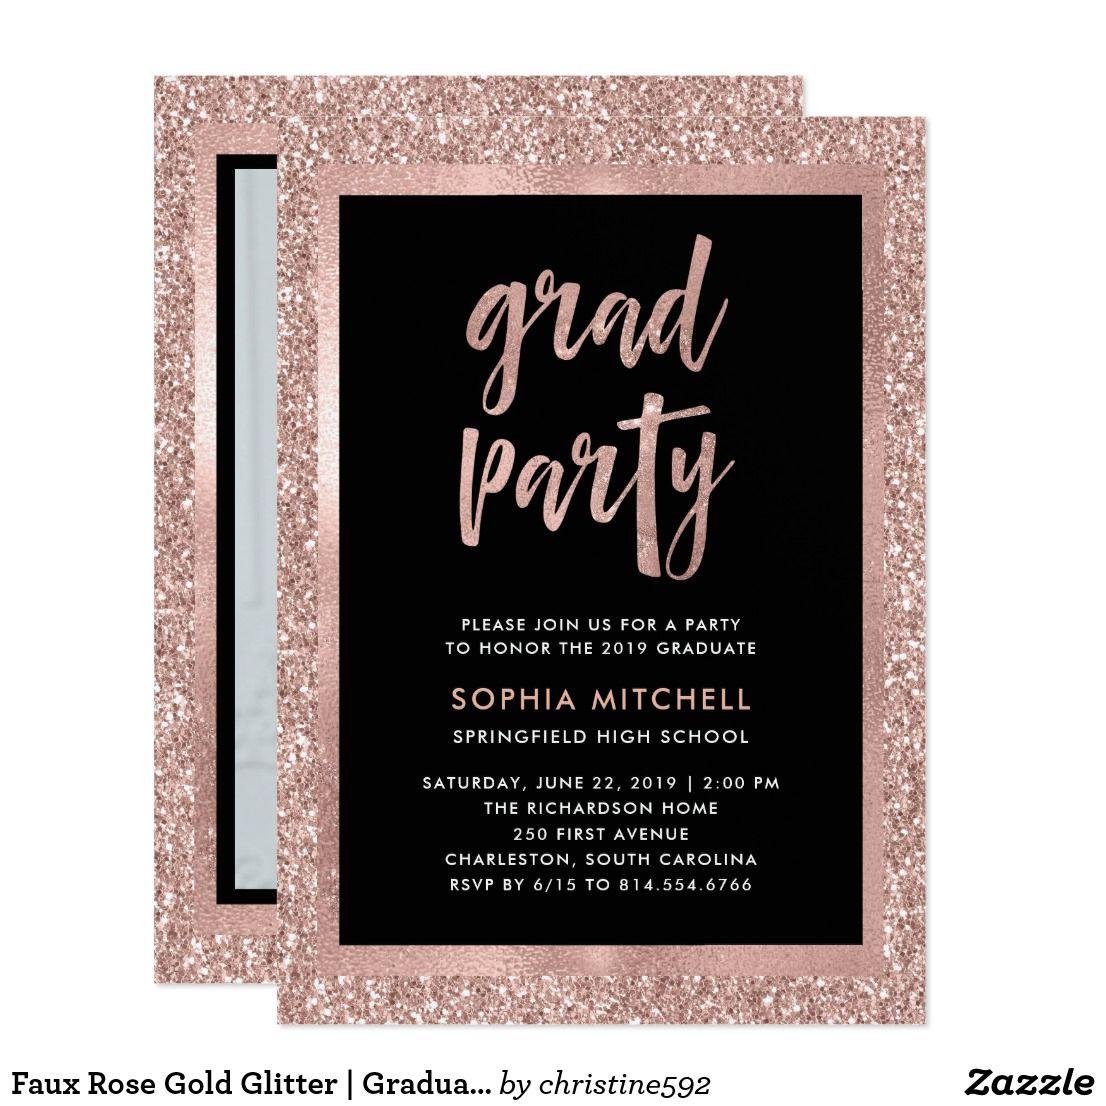 Faux Rose Gold Glitter Graduation Party Photo Invitation